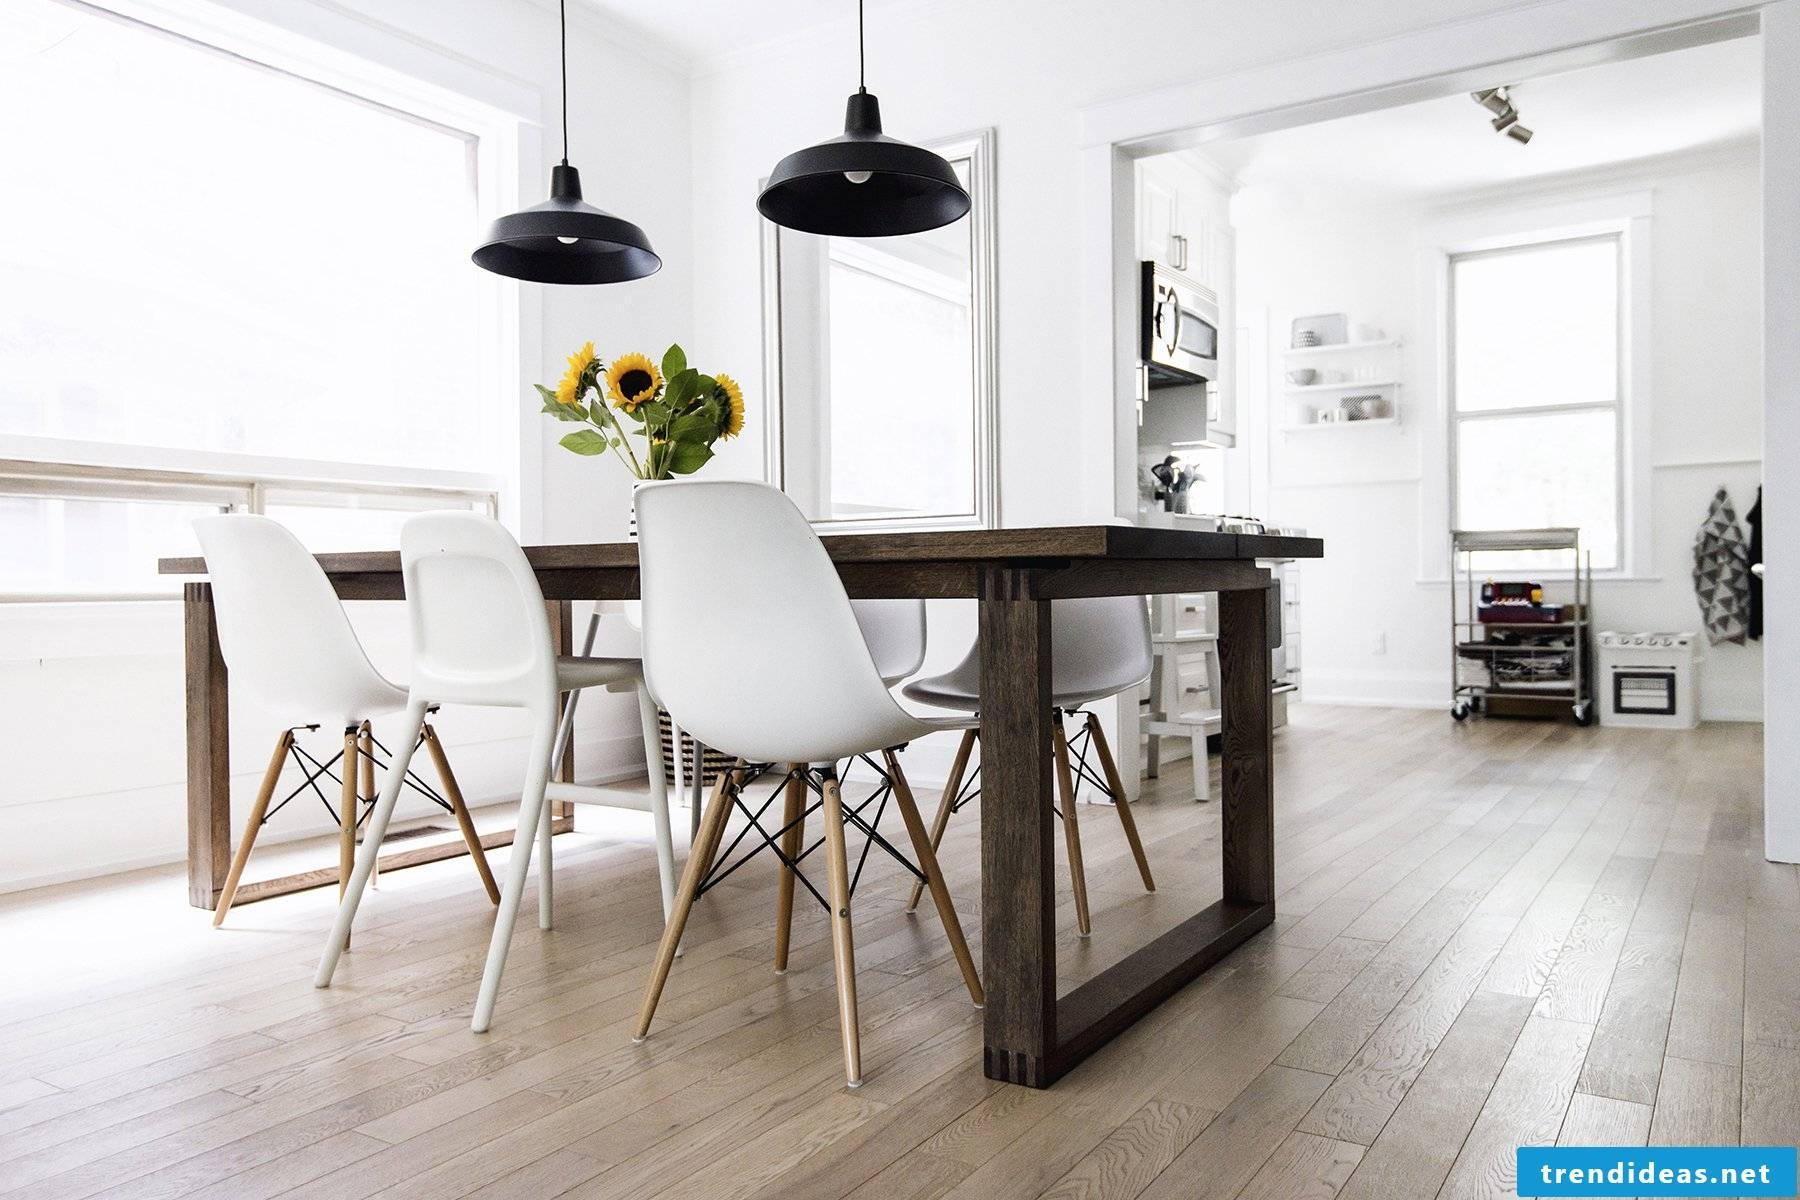 White and minimalist - typical Scandinavian lifestyle